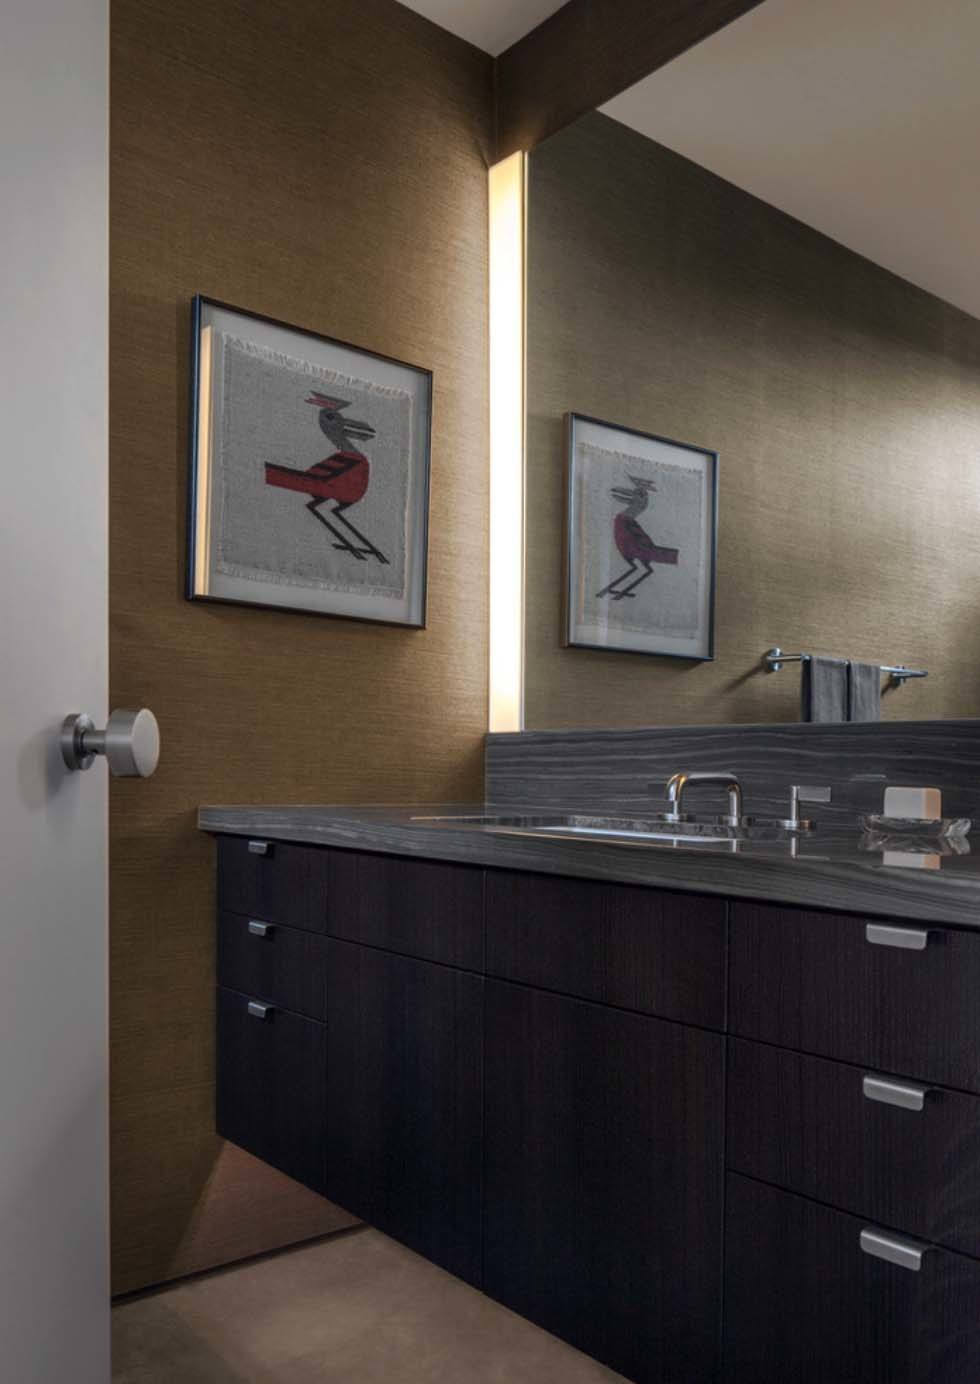 Modern-Residence-Architecture-Marmol-Radziner-08-1 Kindesign